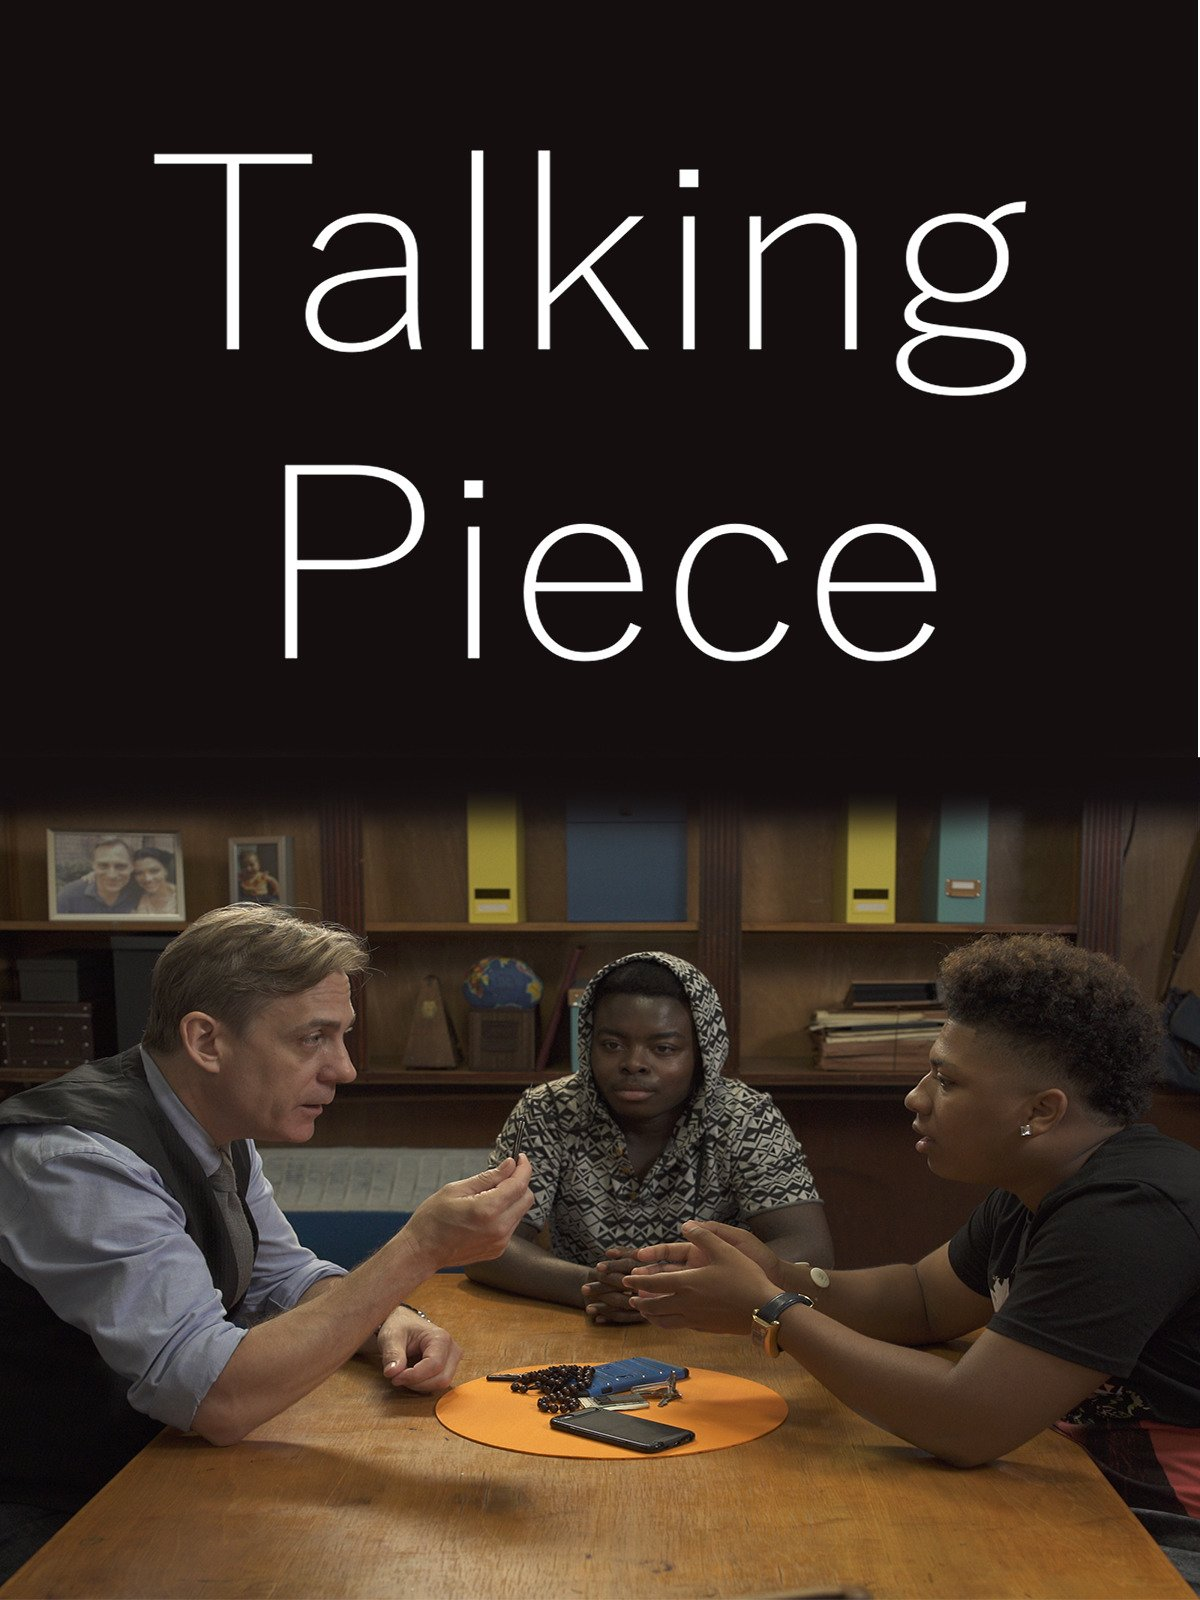 Talking Piece